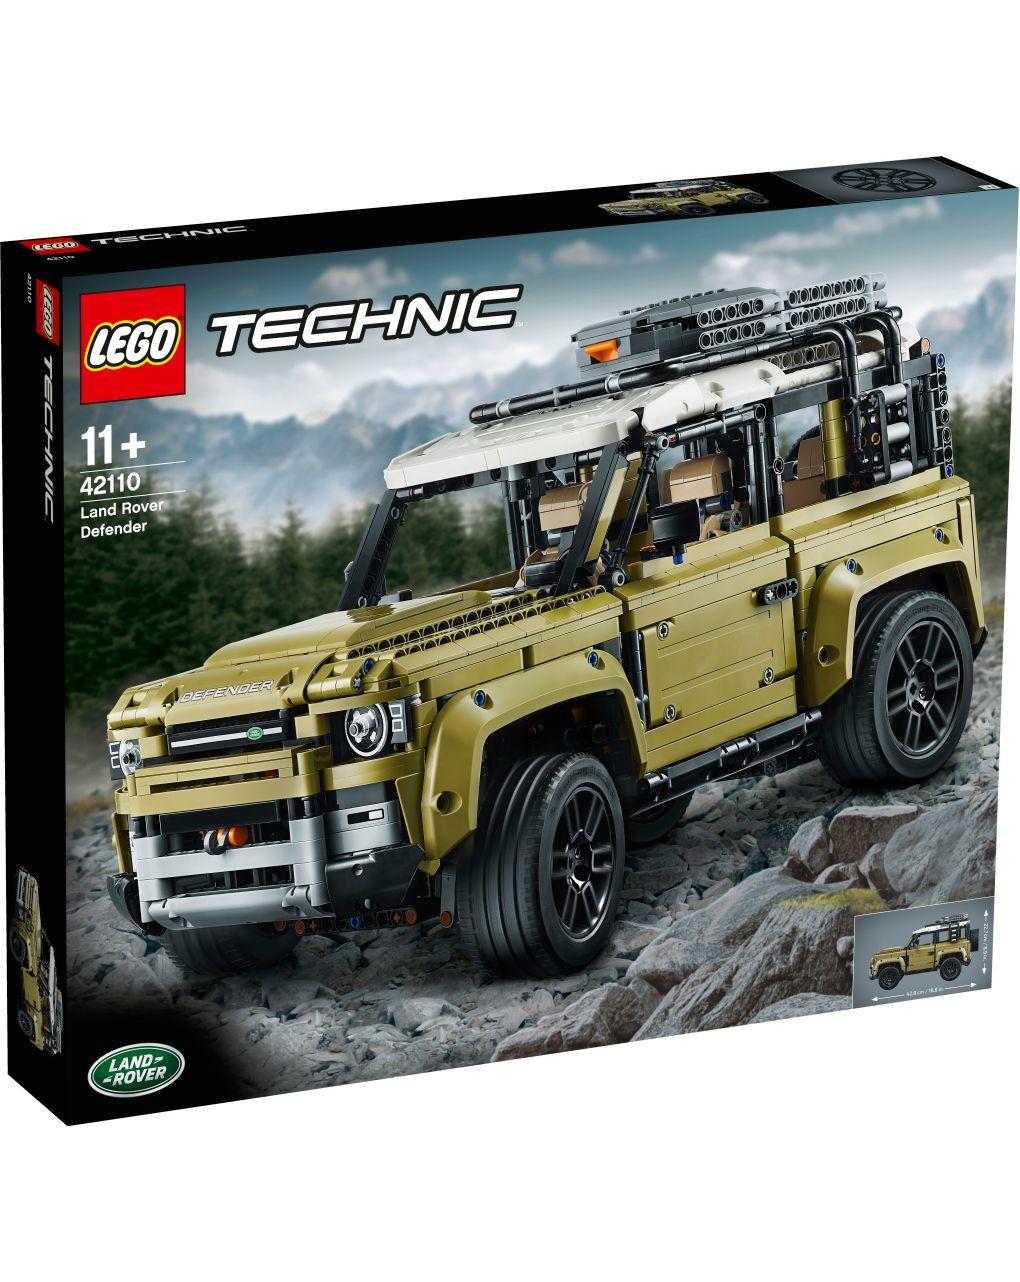 Lego technic - land rover defender - 42110 - LEGO